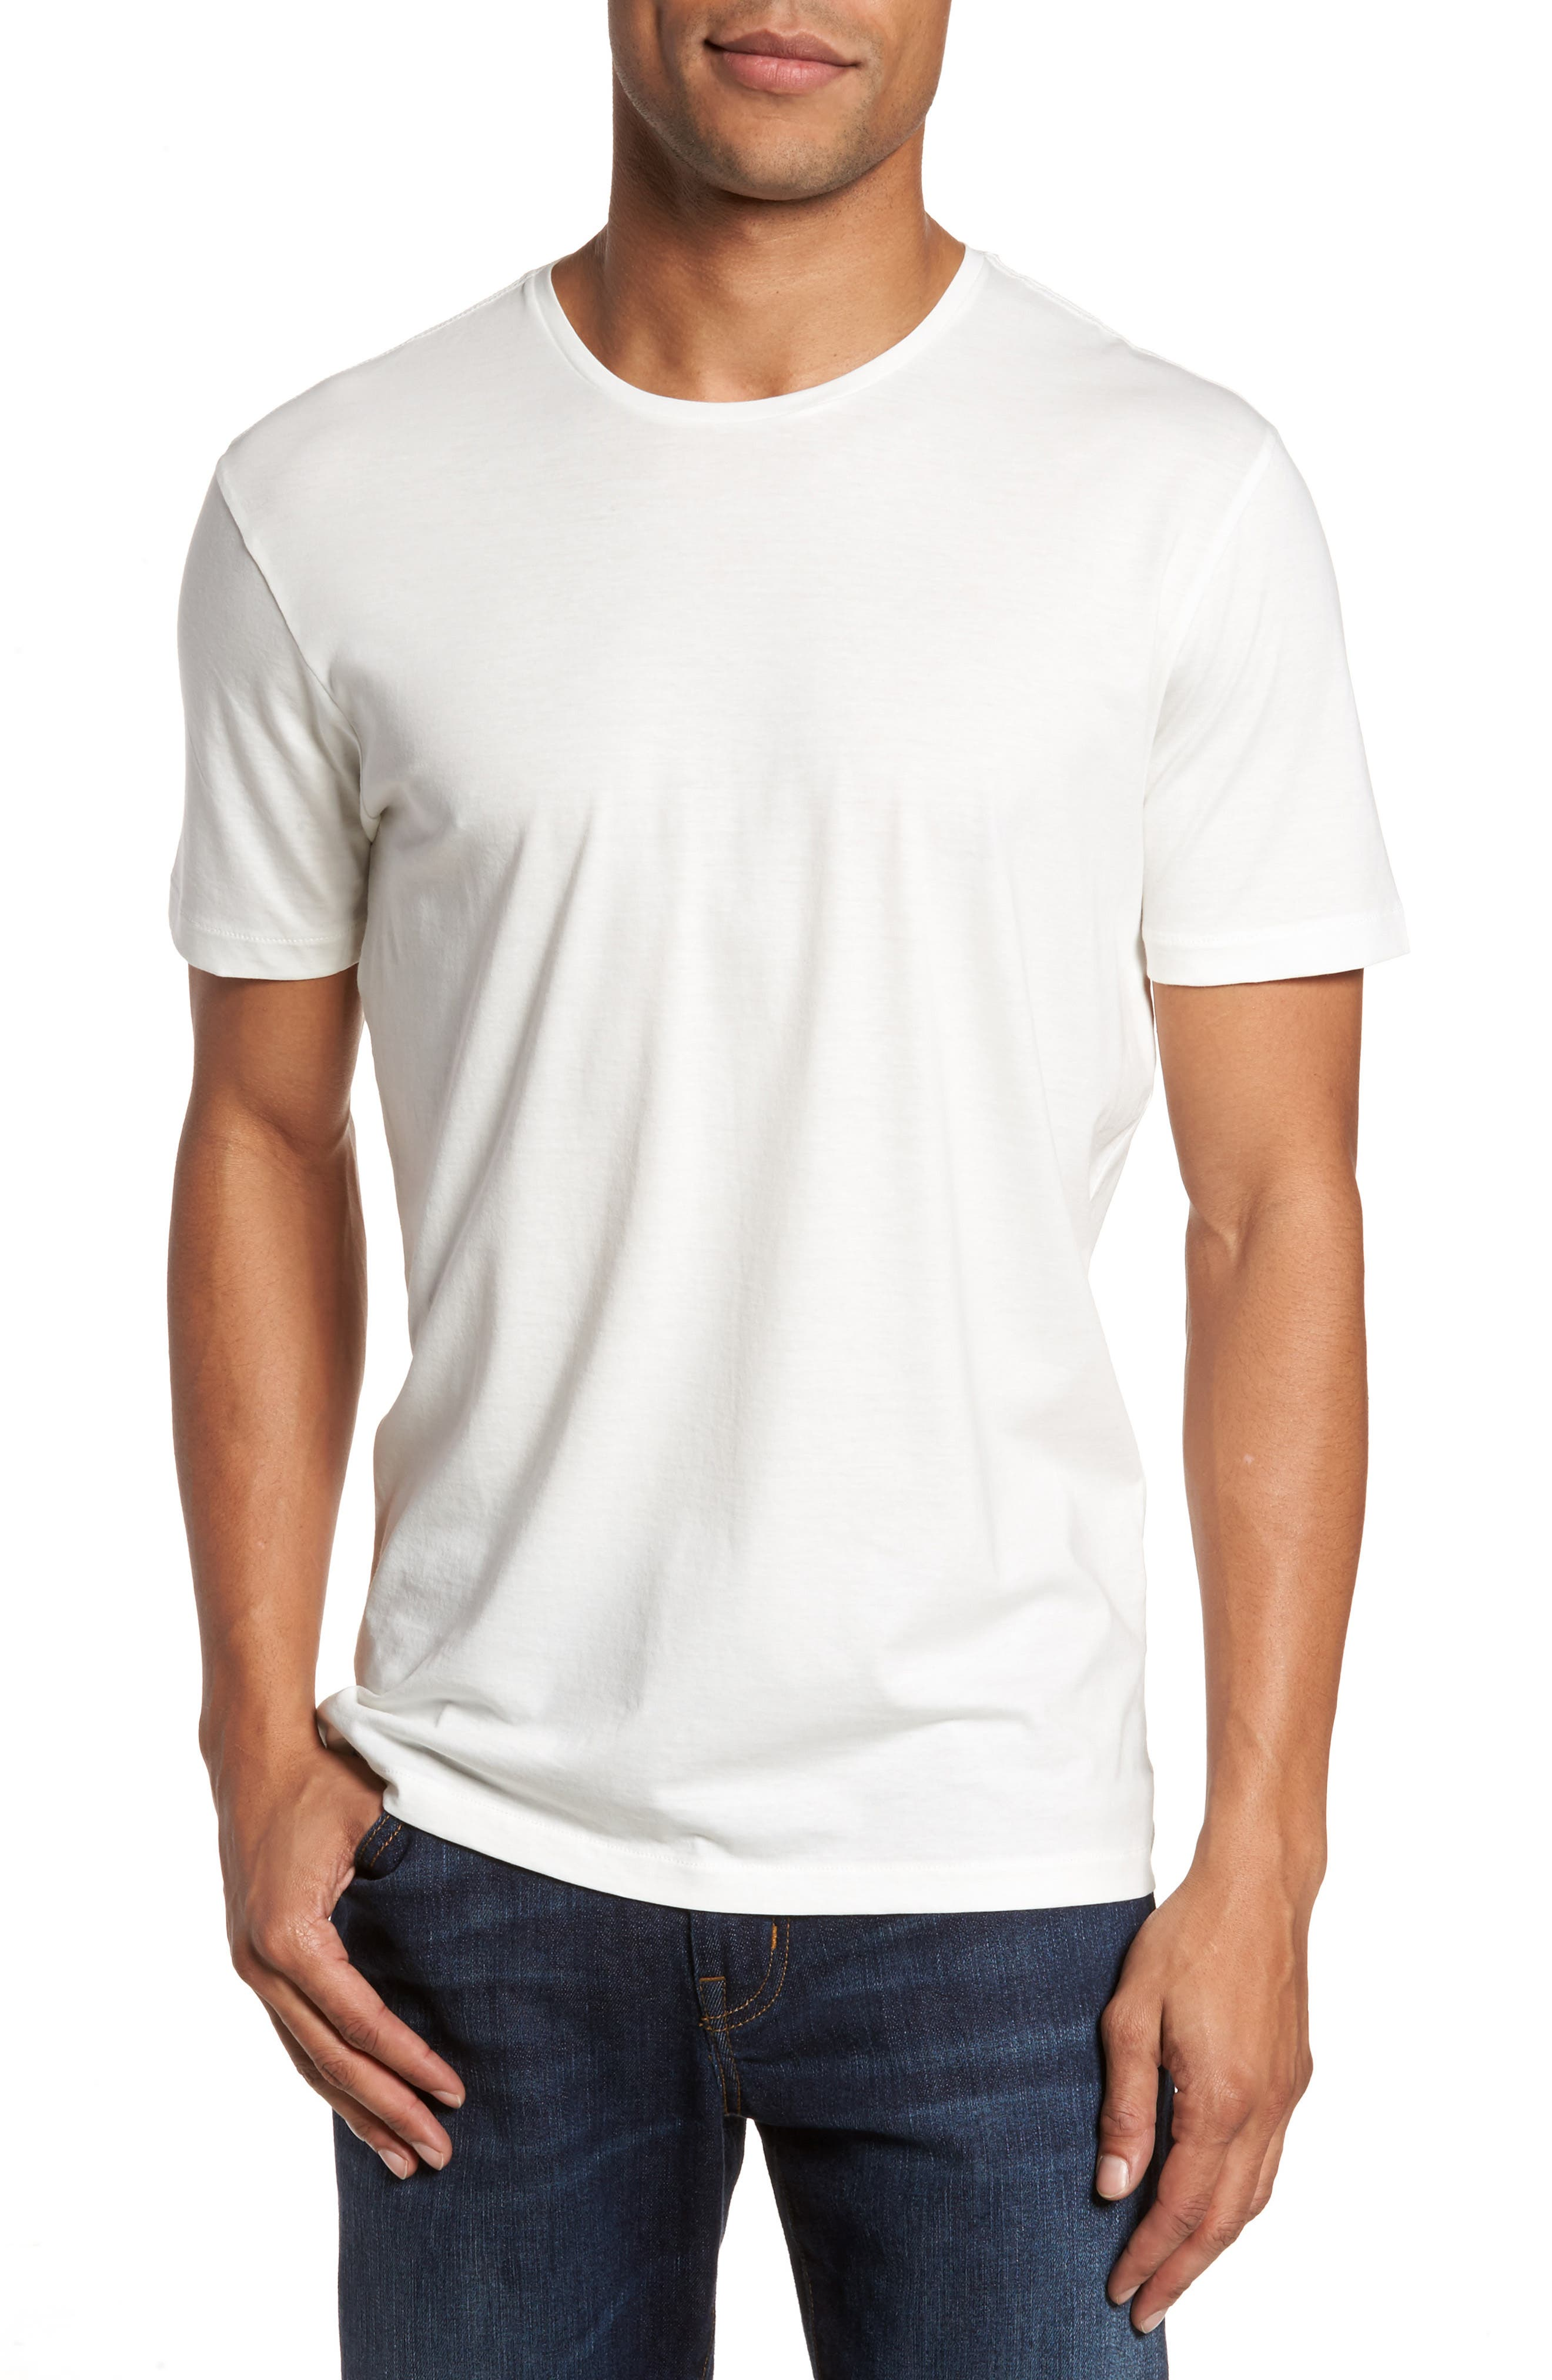 Refined T-Shirt,                             Main thumbnail 1, color,                             White